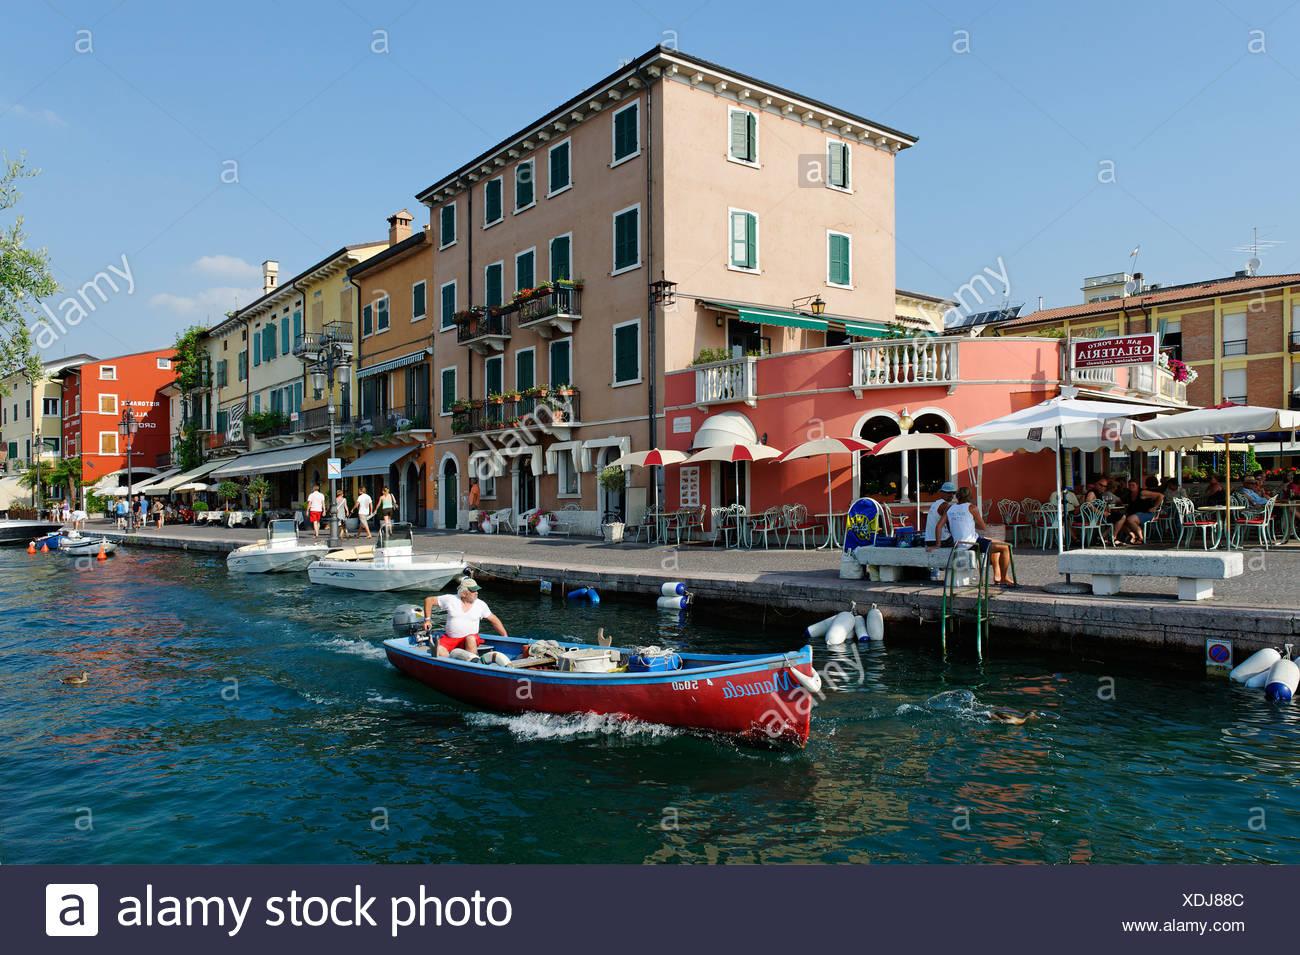 Seepromenade in Lazise am Gardasee, Lago di Garda, Venetien, Italien, Europa Stockbild